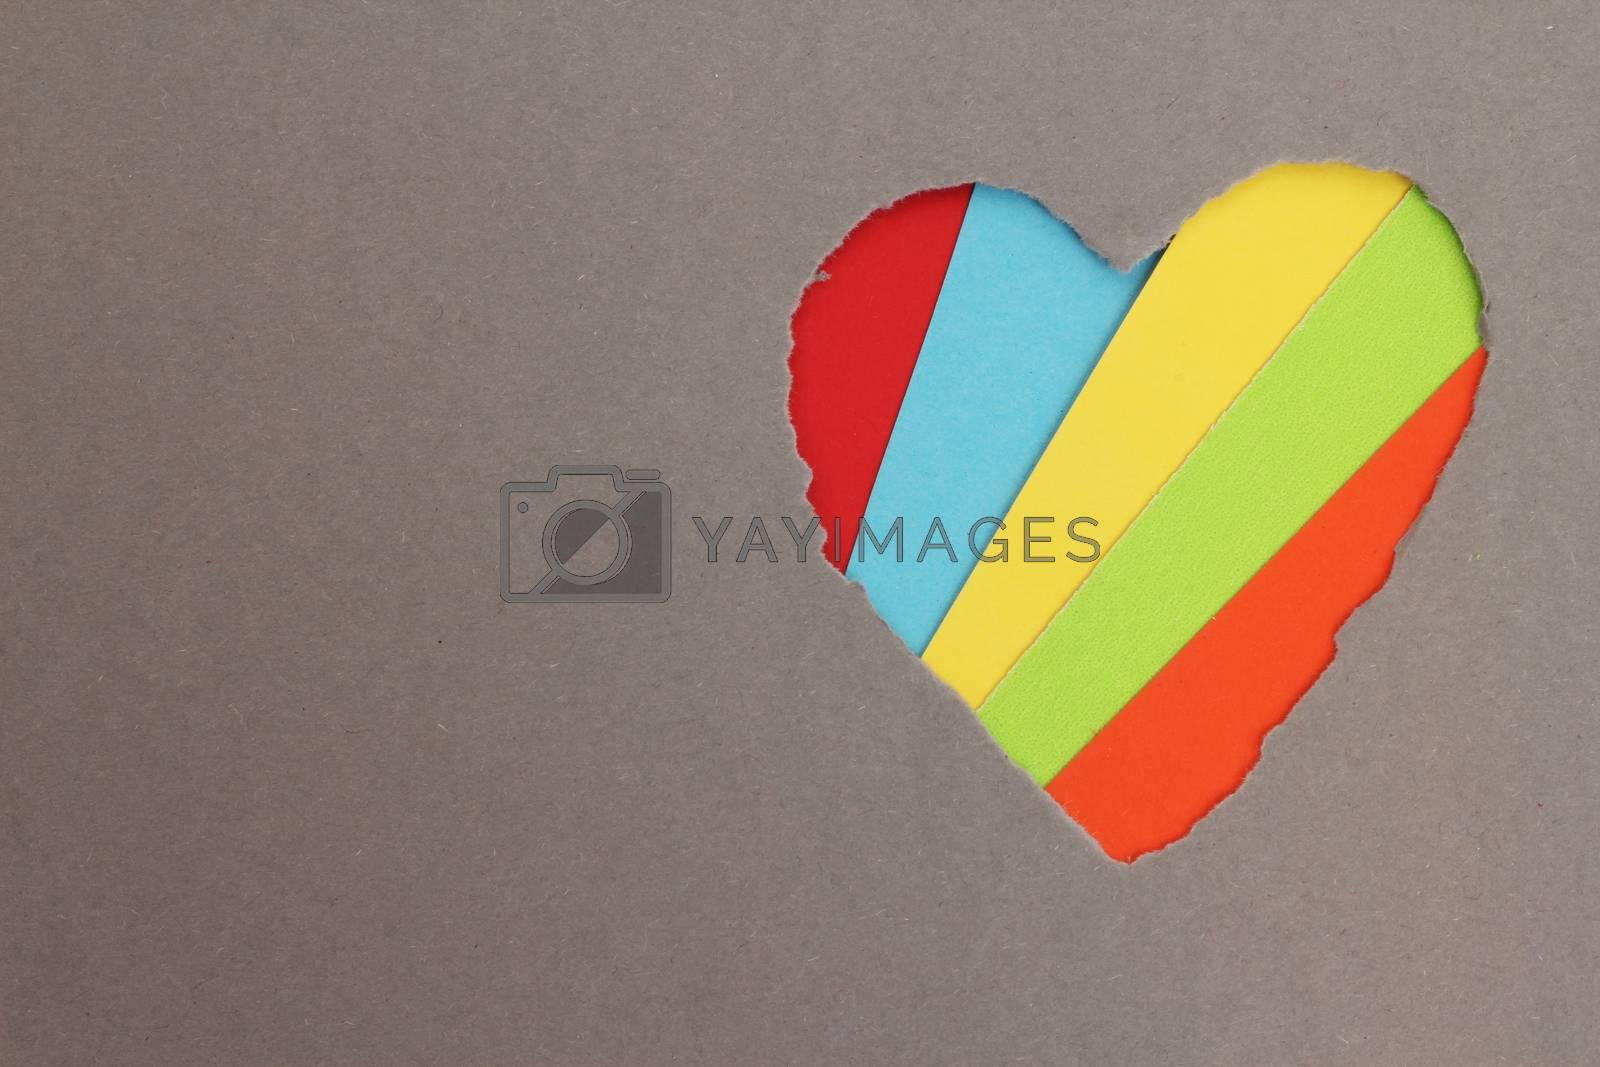 Torn heart in paper by Liubov Mikhaylova